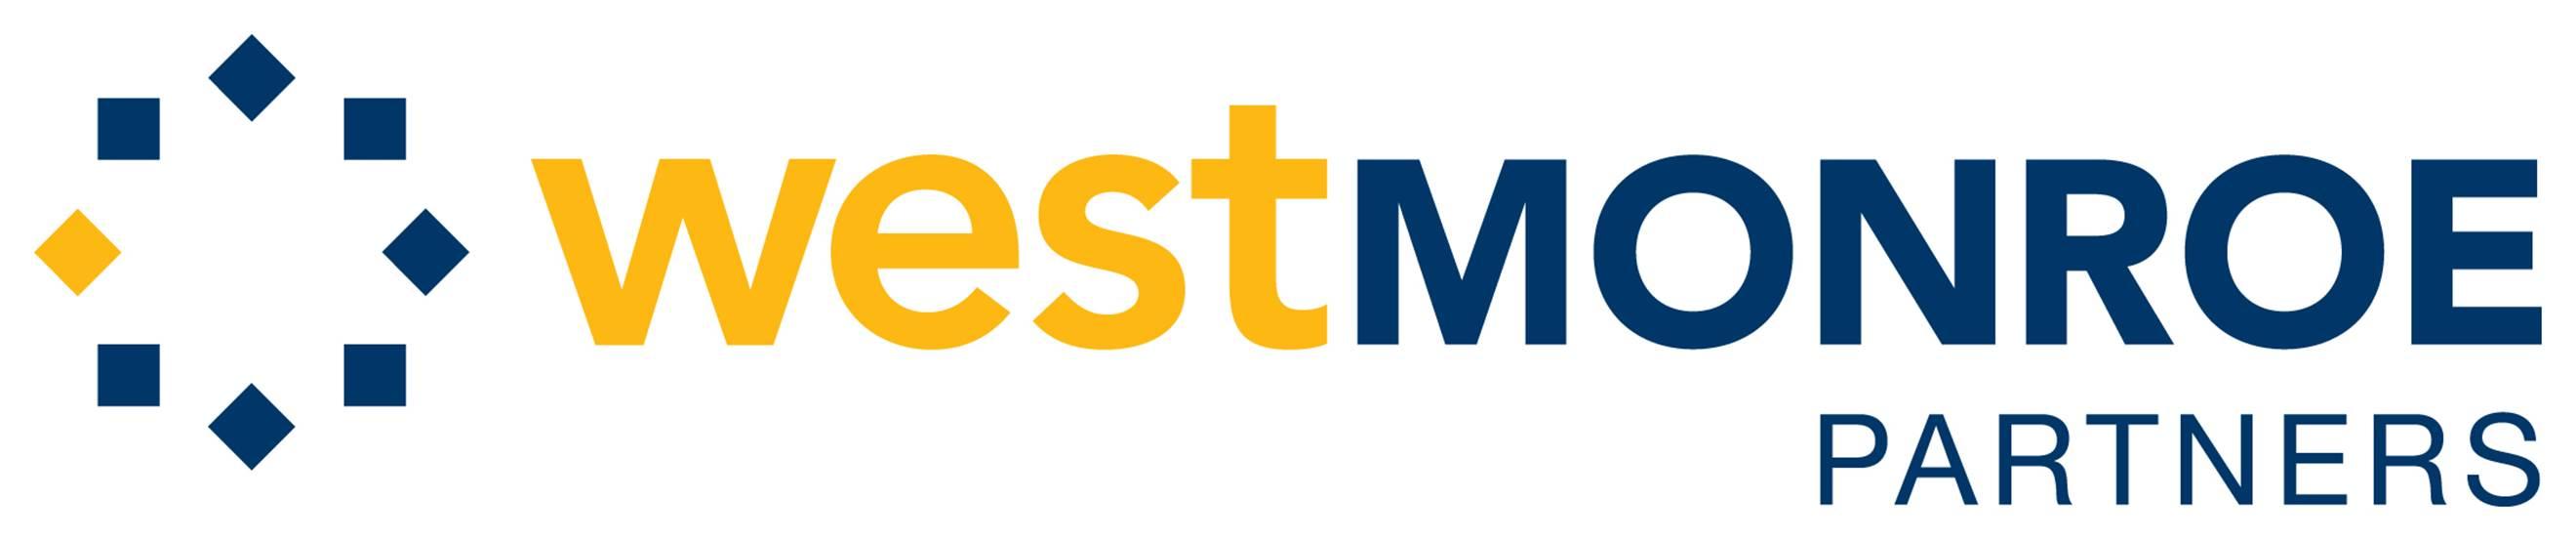 West Monroe Partners logo